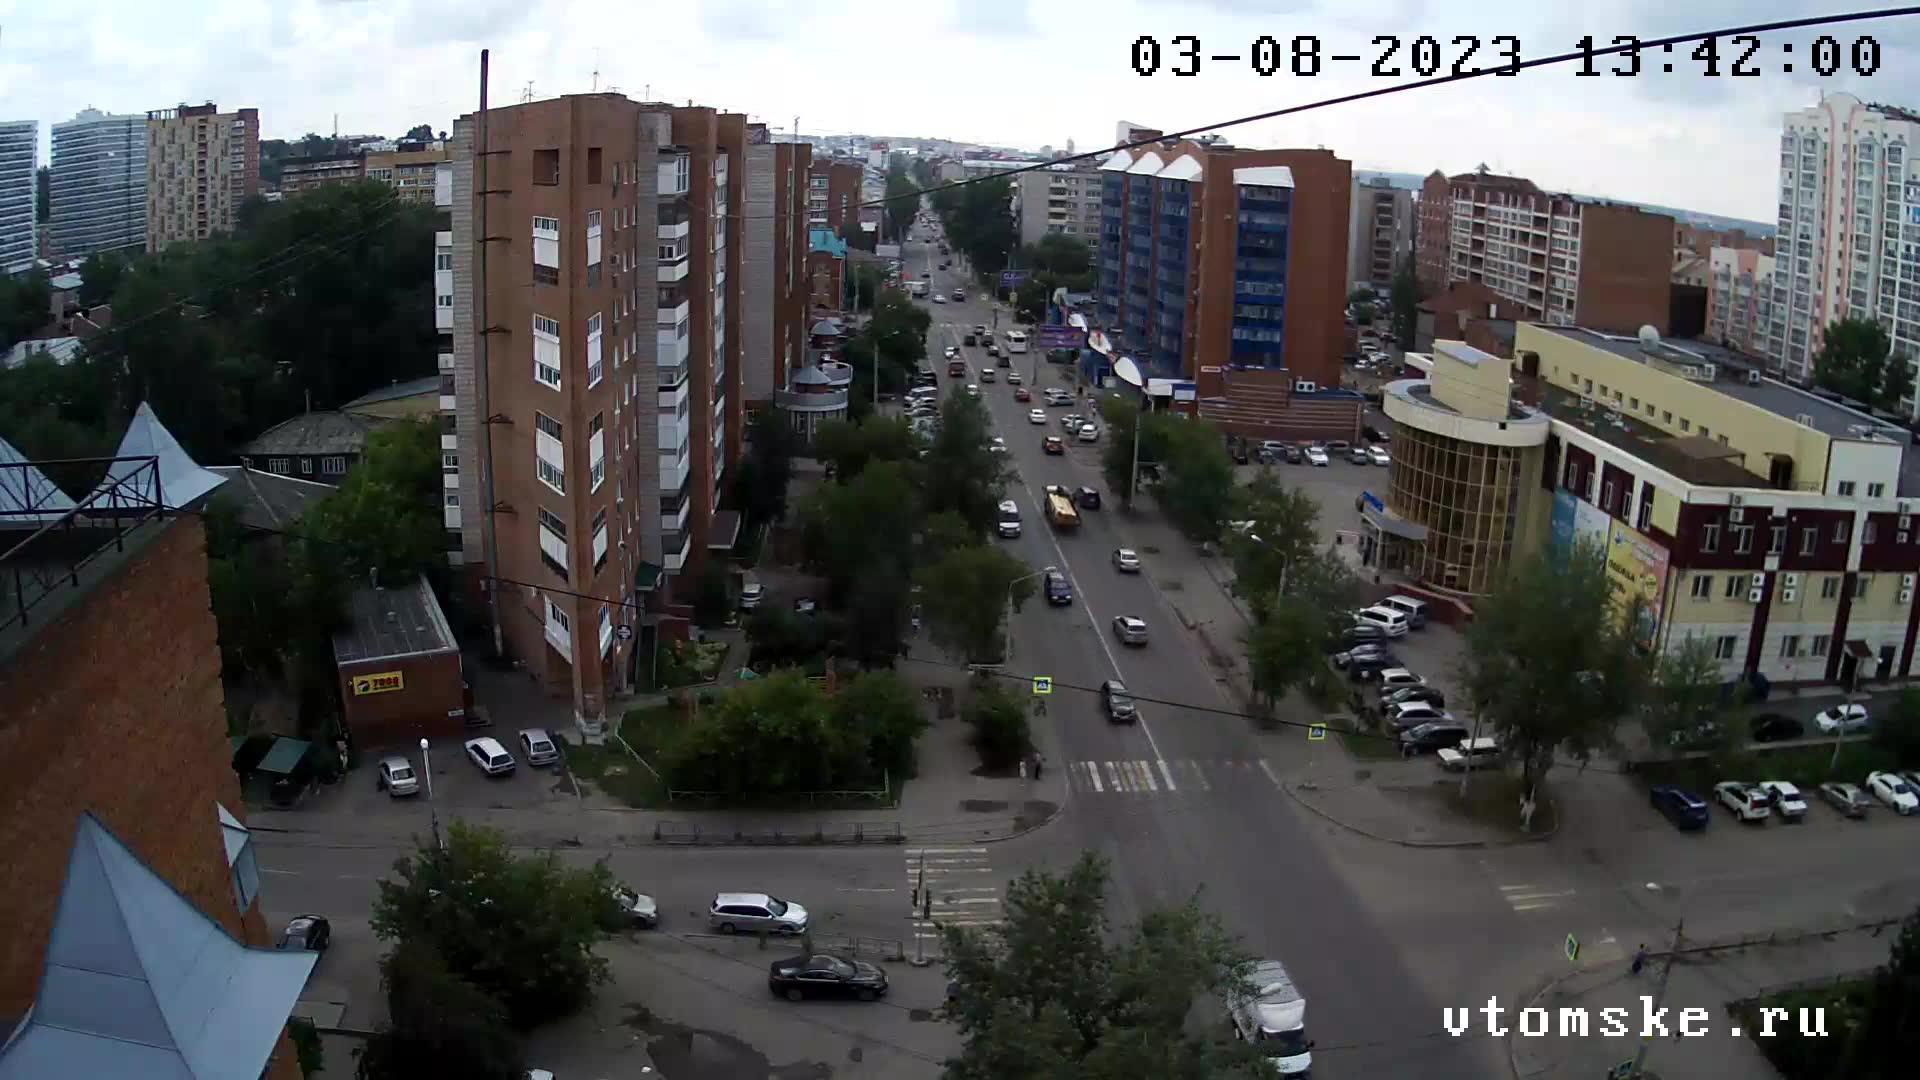 Webcam Tomsk: Перекресток пр. Ленина − пер. Тихий